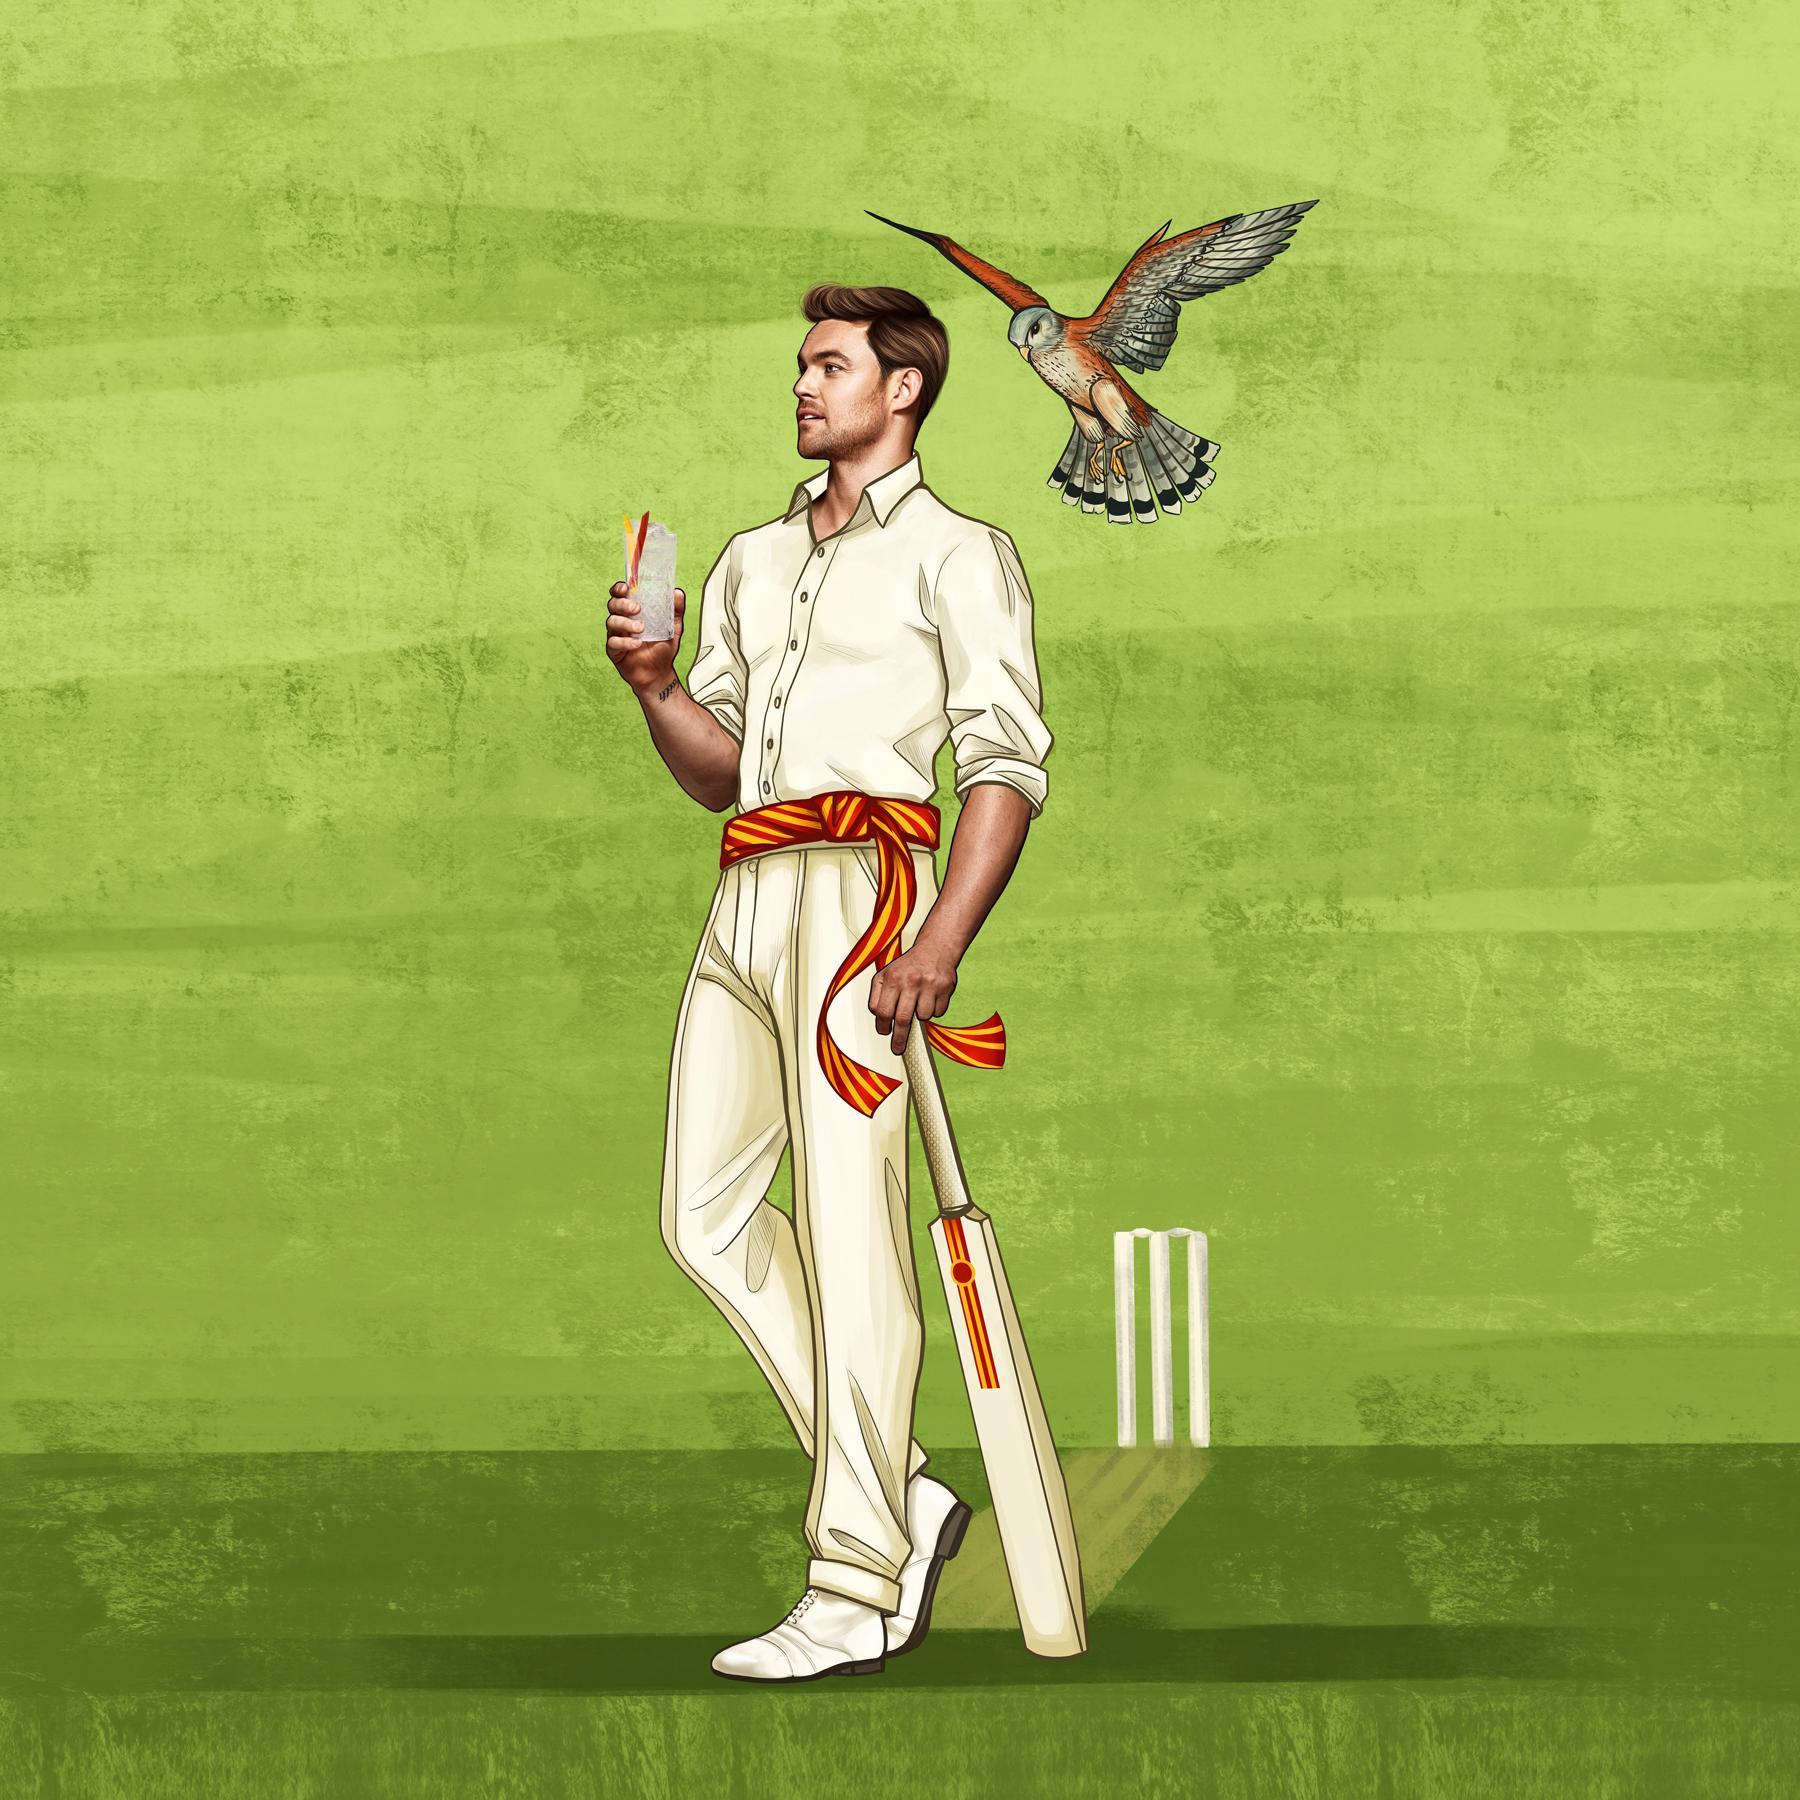 Nicholson_CricketMan_NEW_bg.jpg